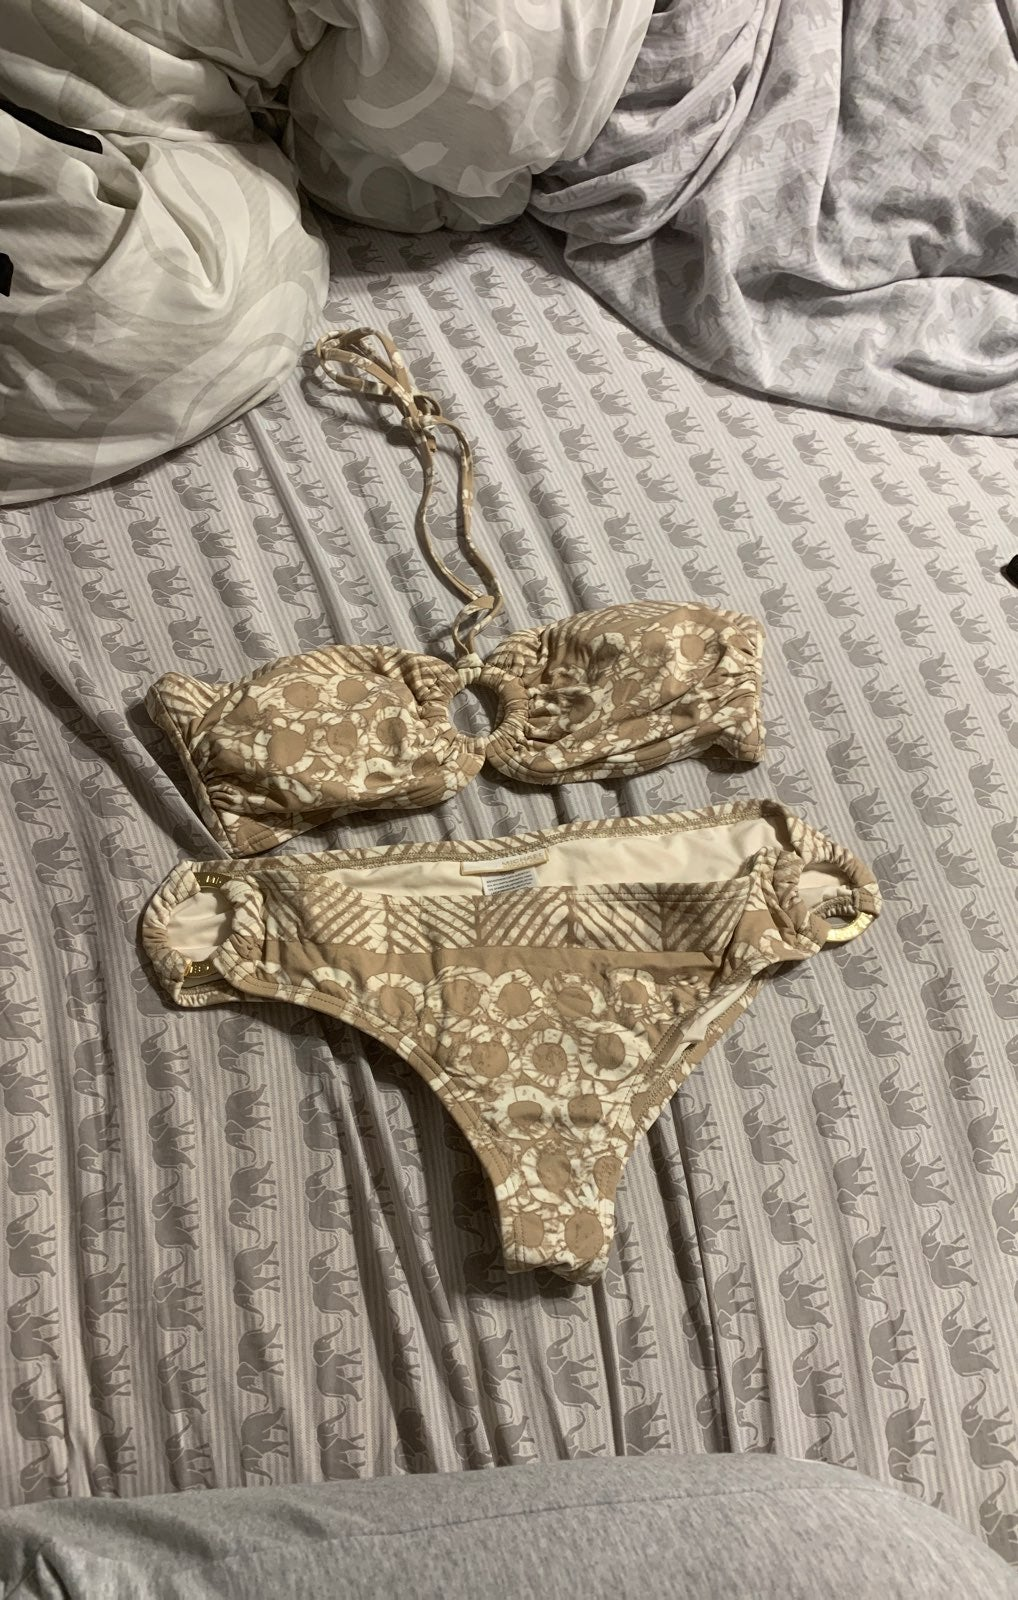 Michael Kors Bikini top & bottom